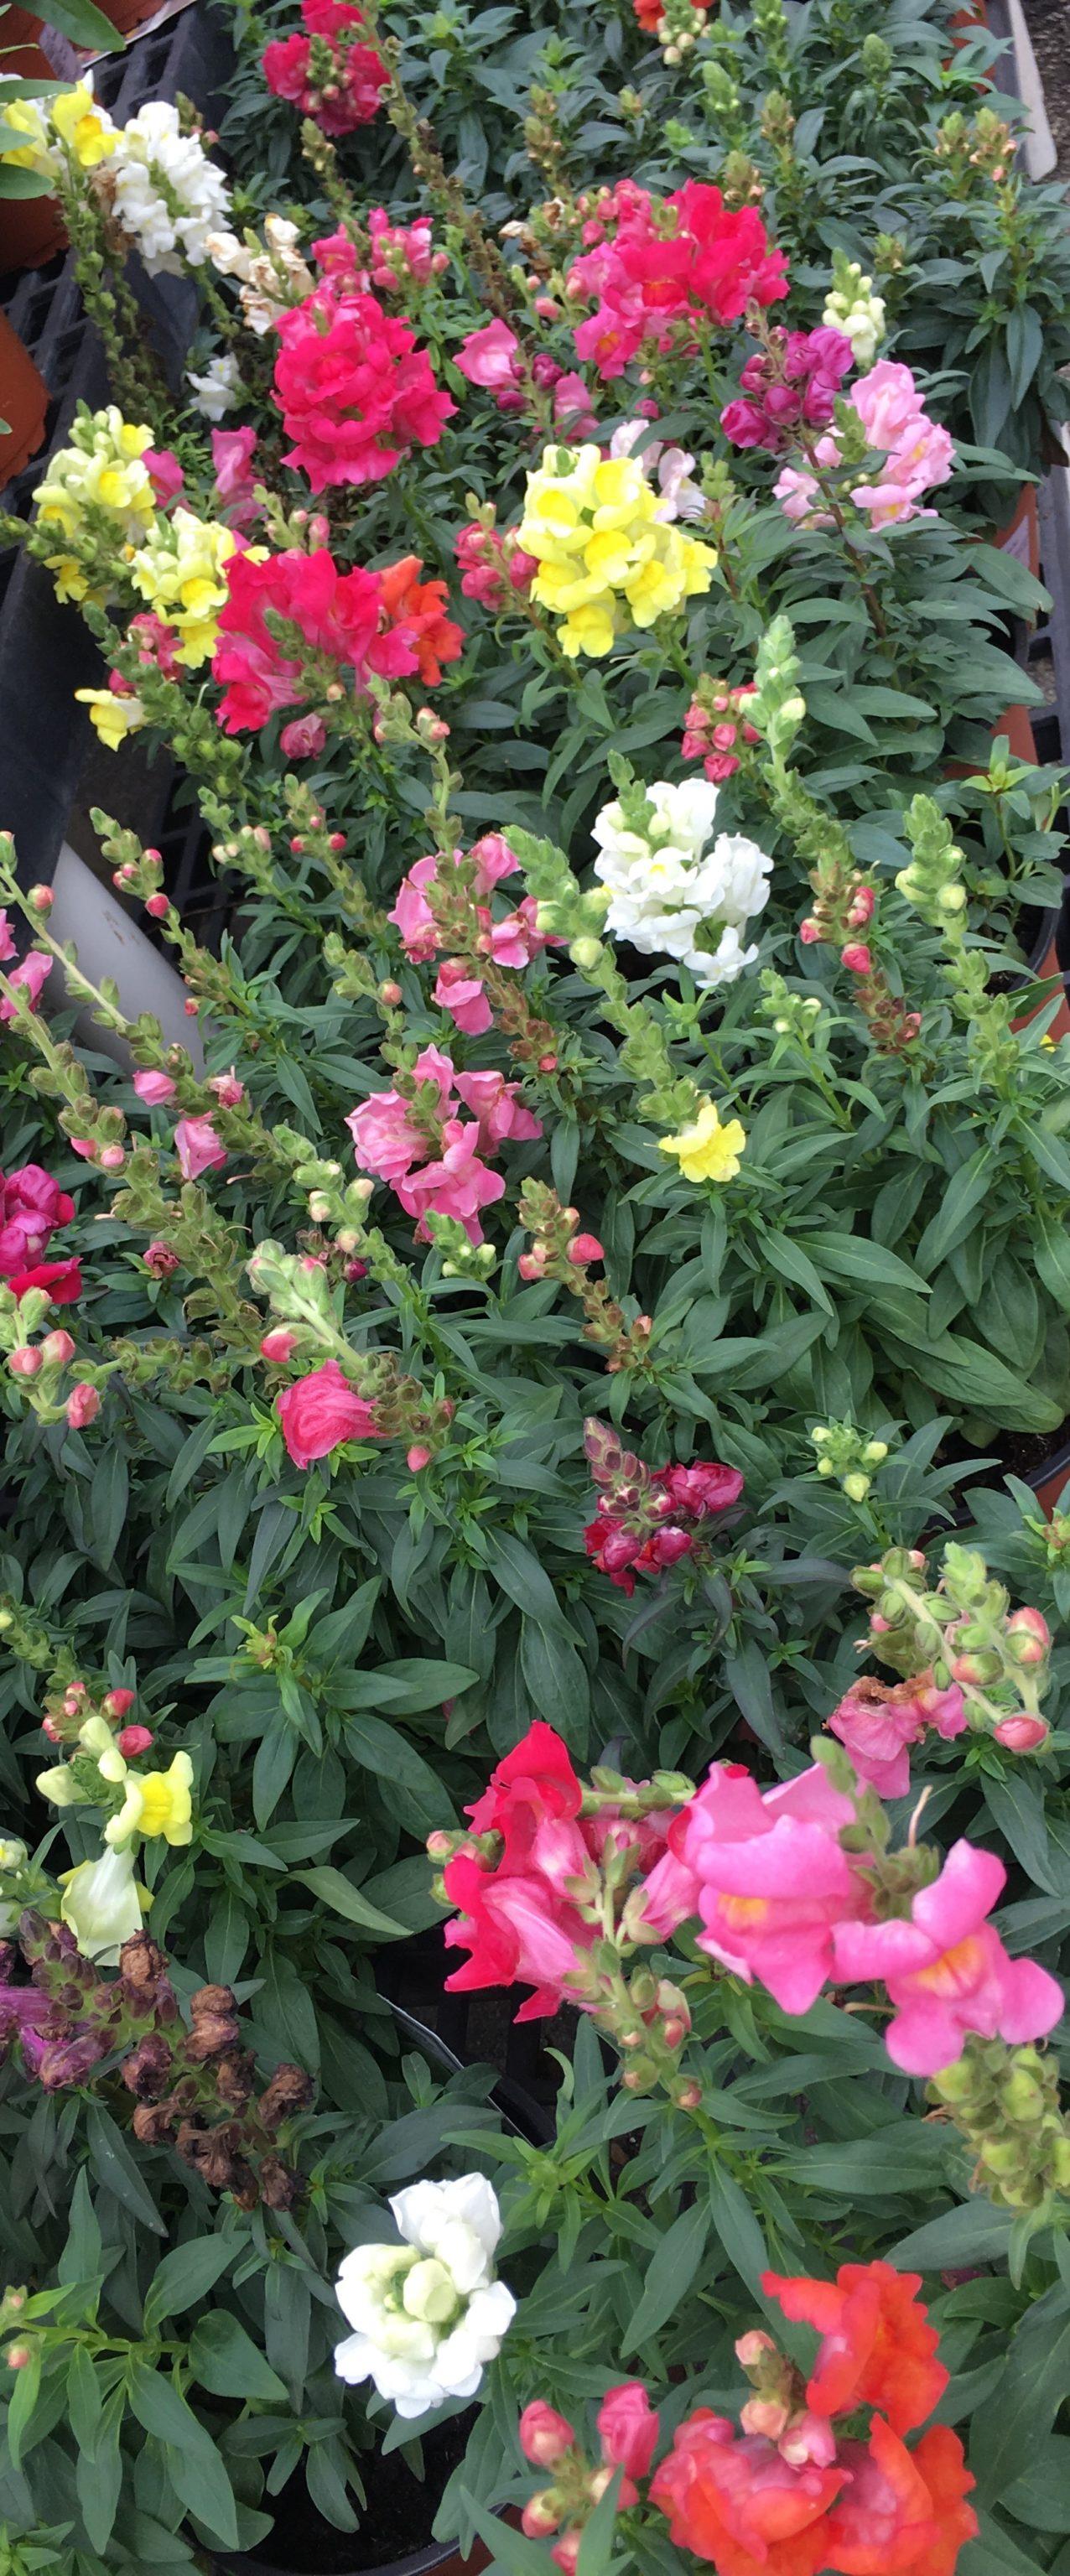 flowers for landscape